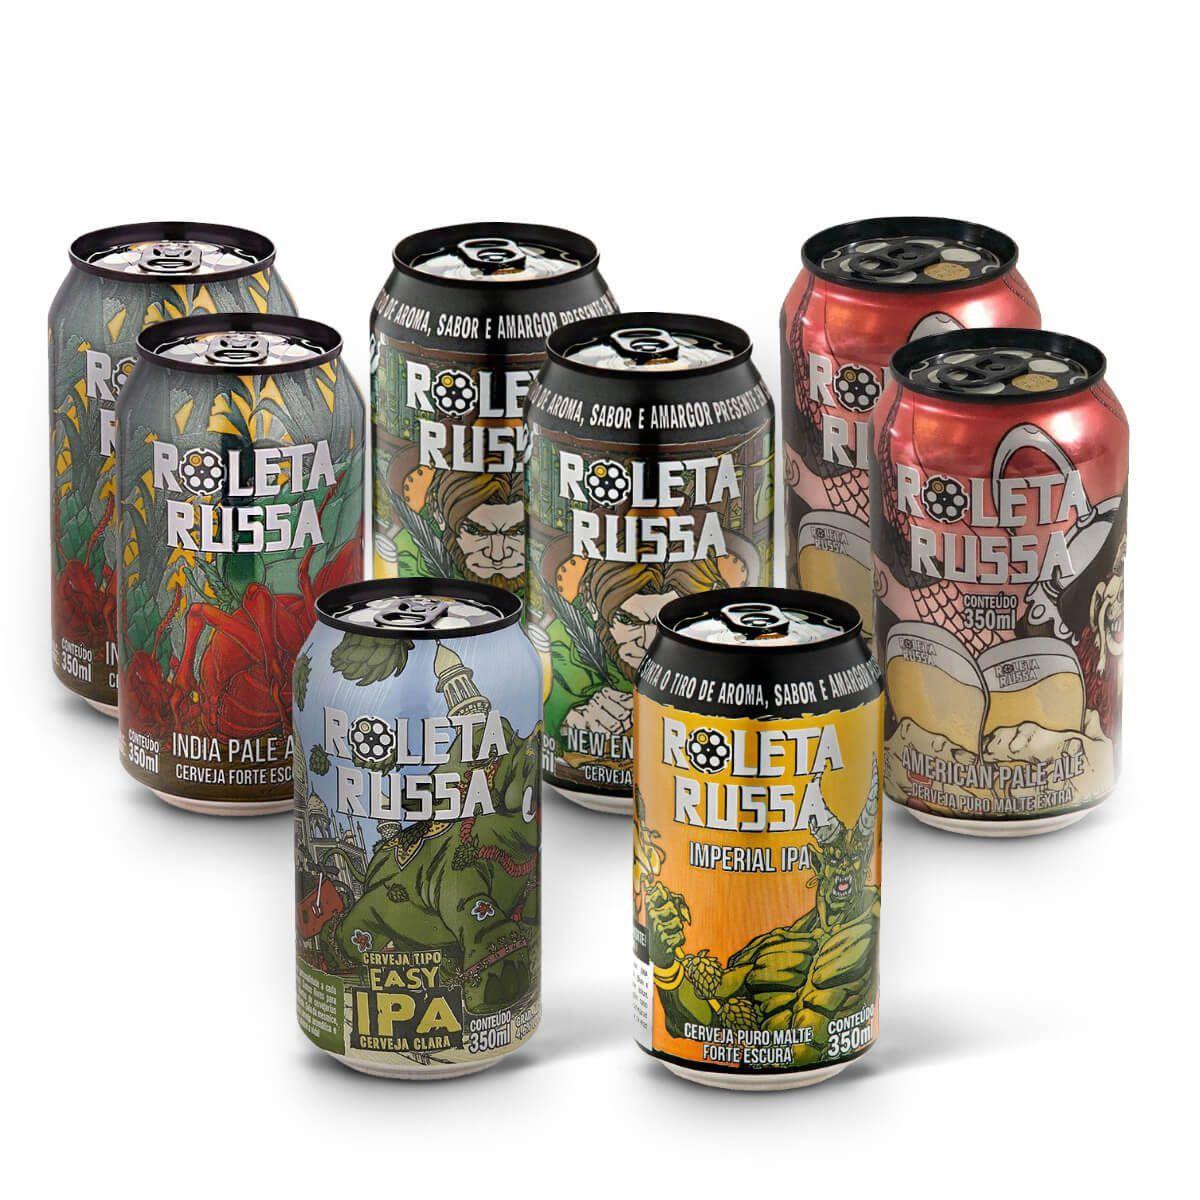 Kit degustação Roleta Russa 8 cervejas lata